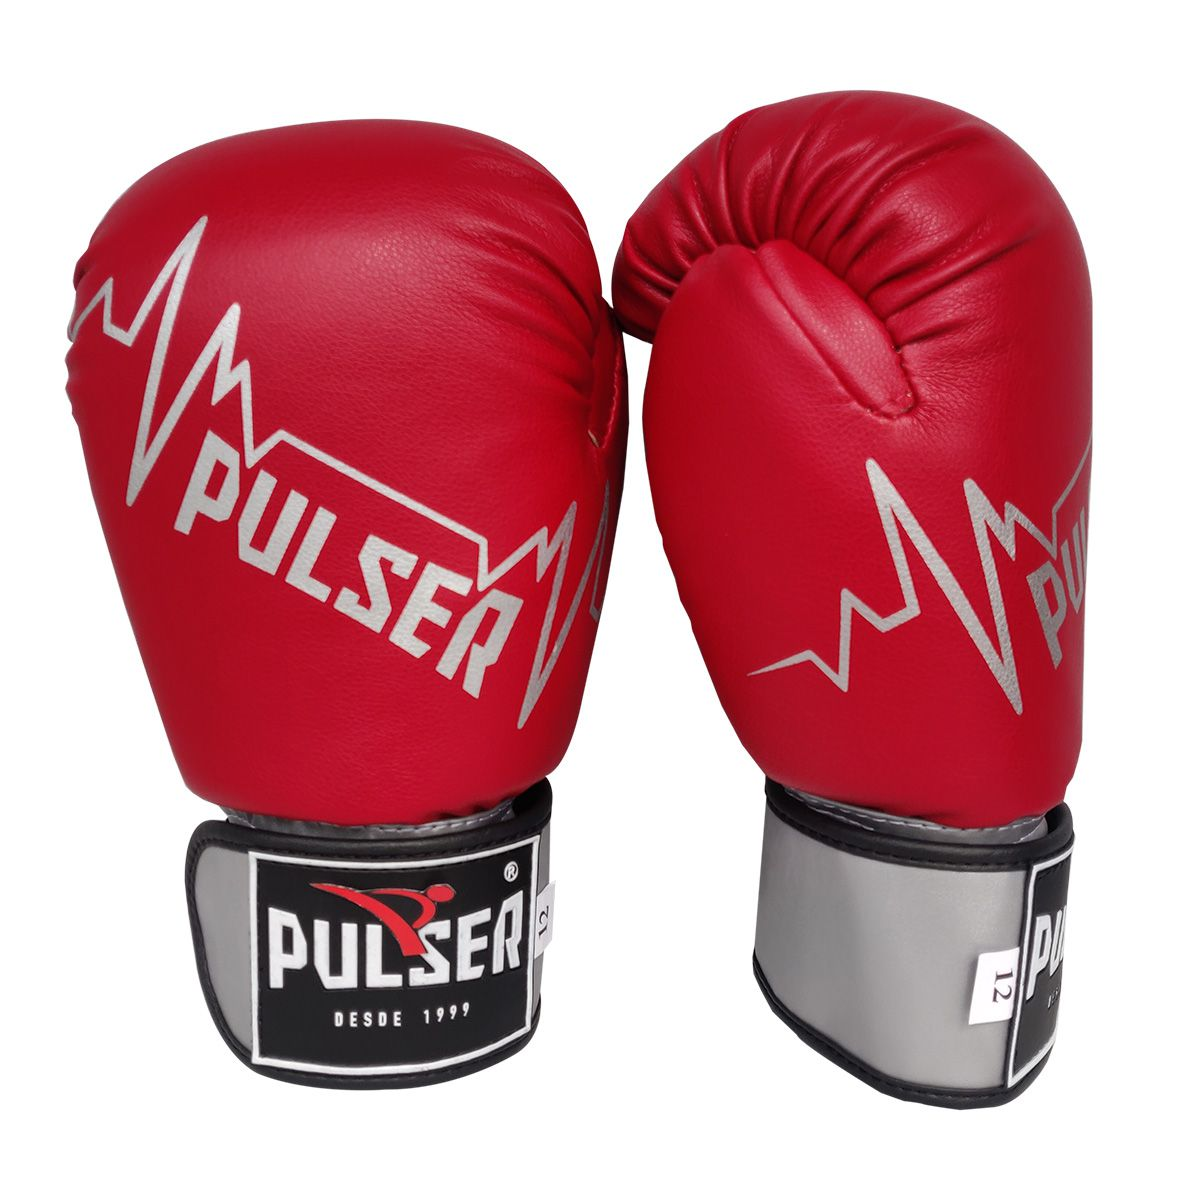 Kit de Boxe / Muay Thai 12oz - Vermelho Pulser - Pulser  - PRALUTA SHOP